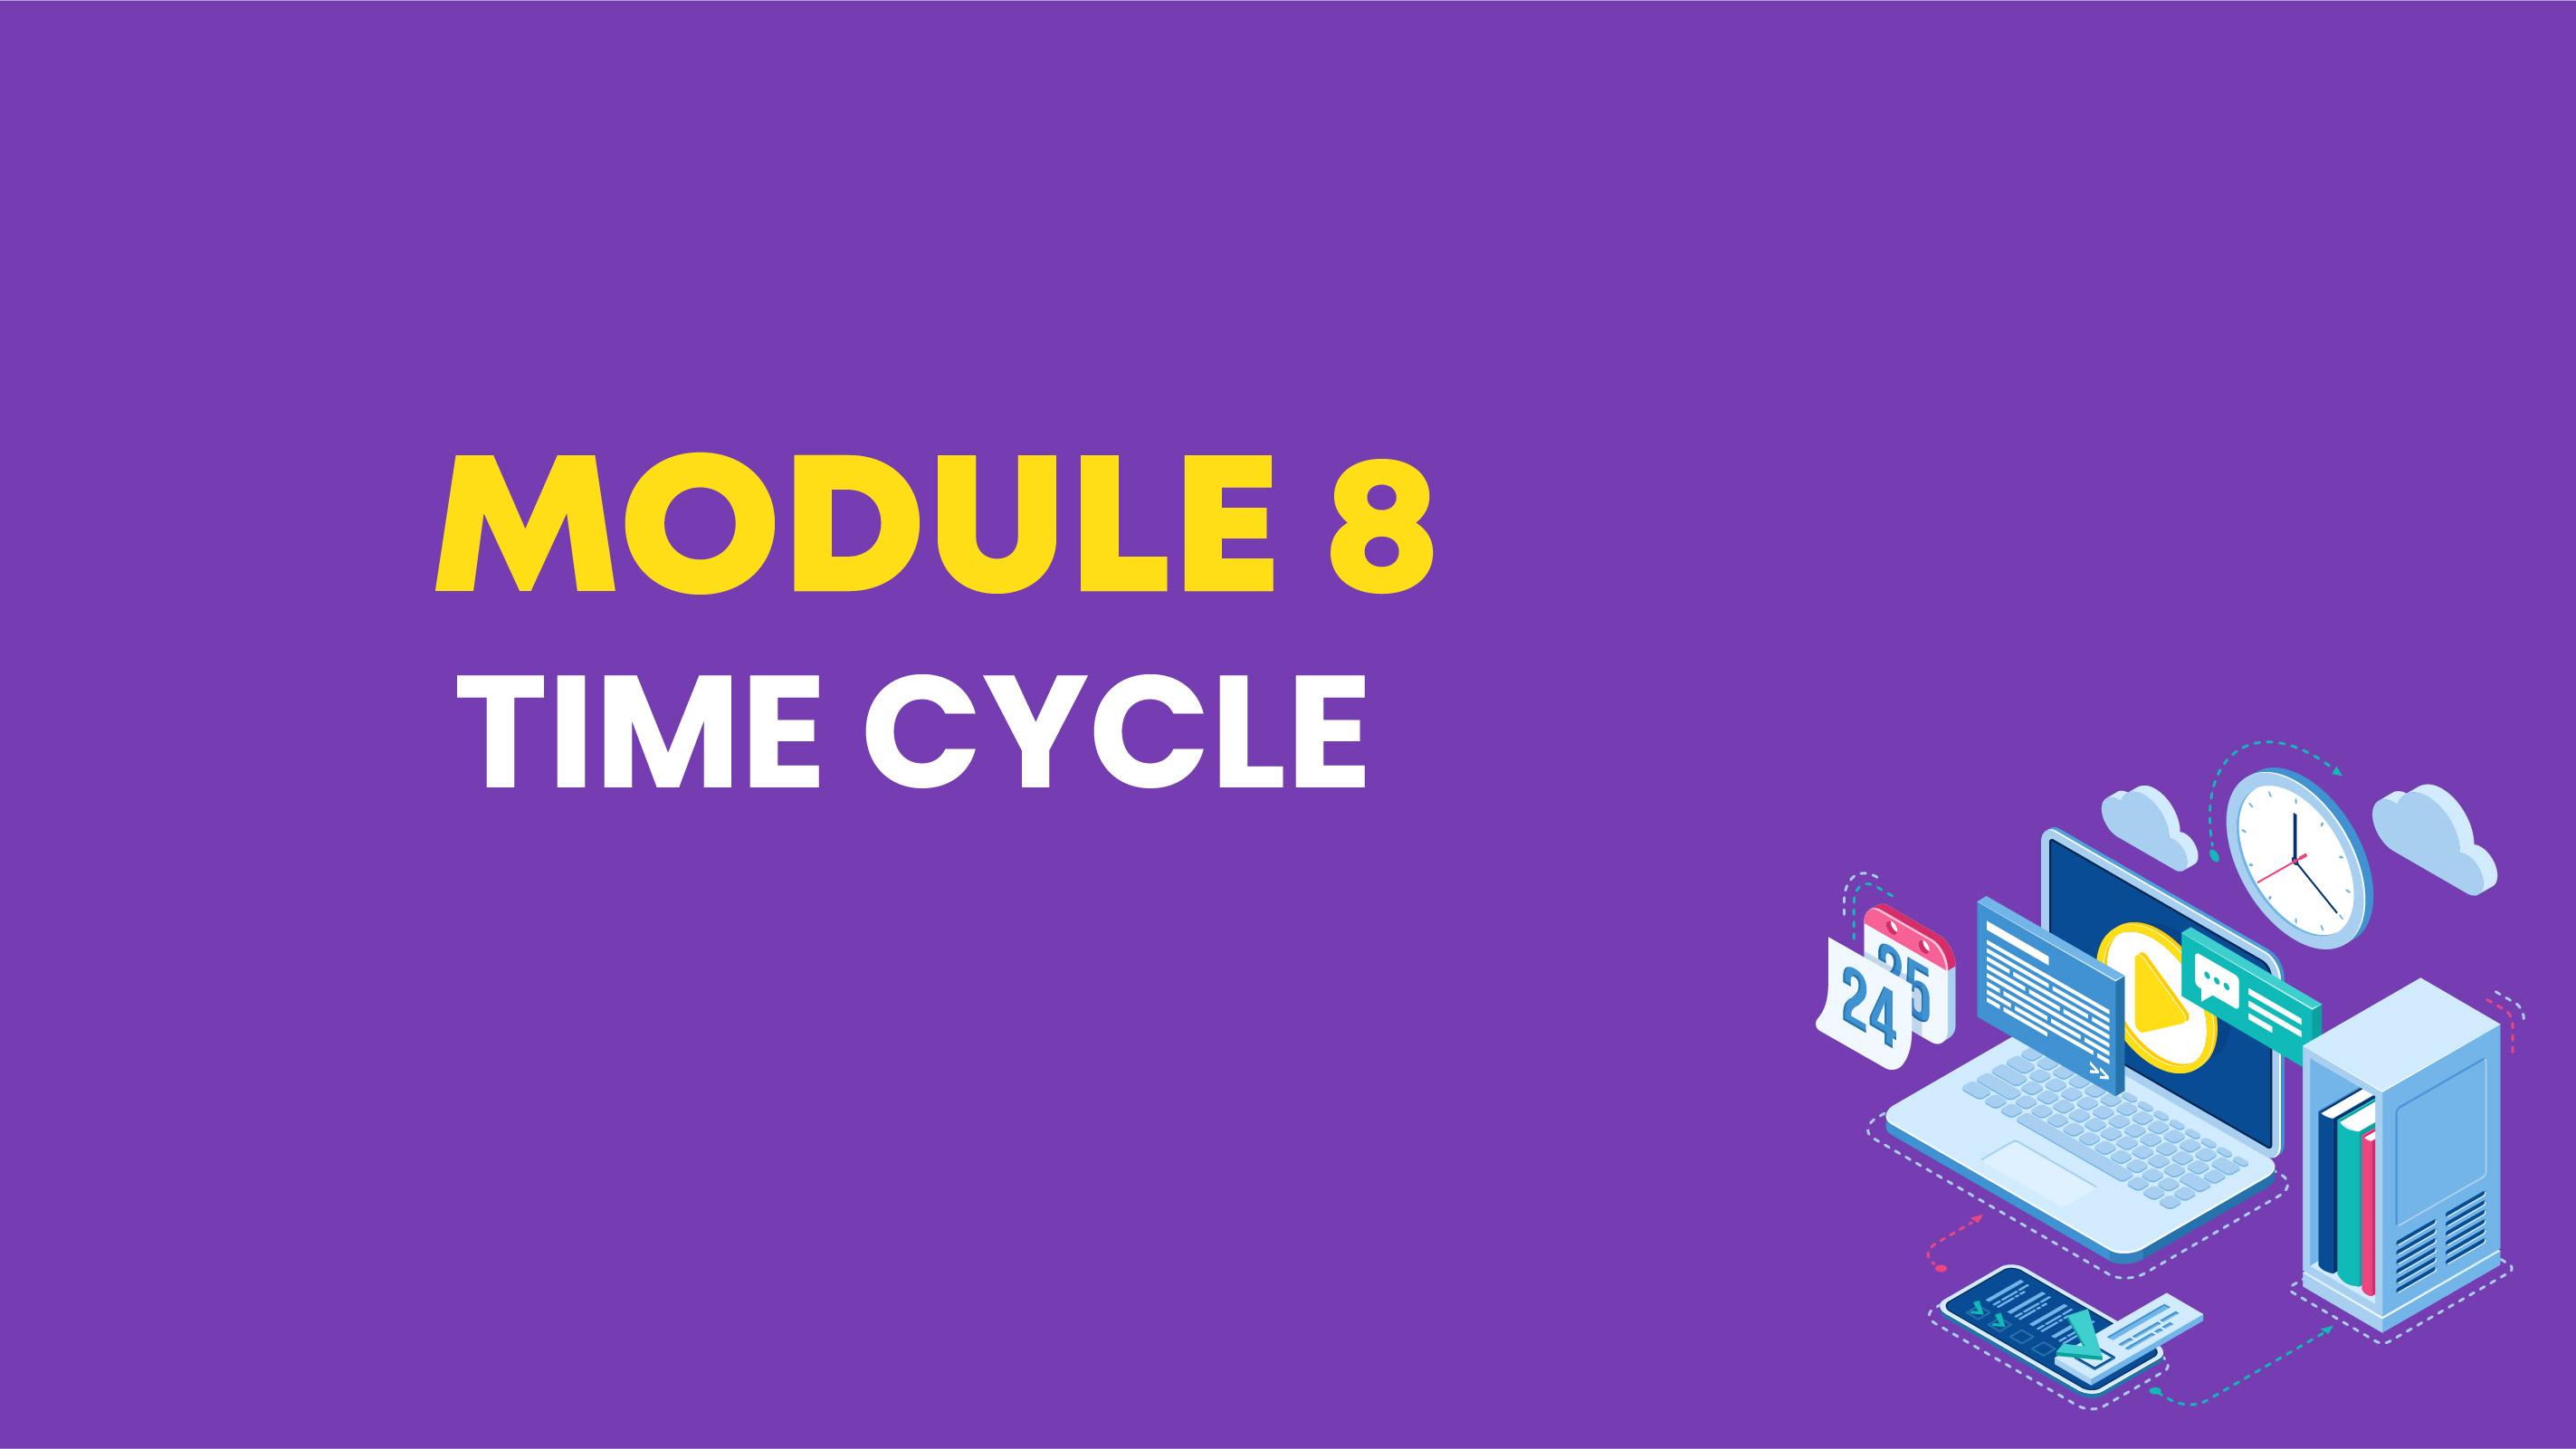 MODULE 8: TIME CYCLE